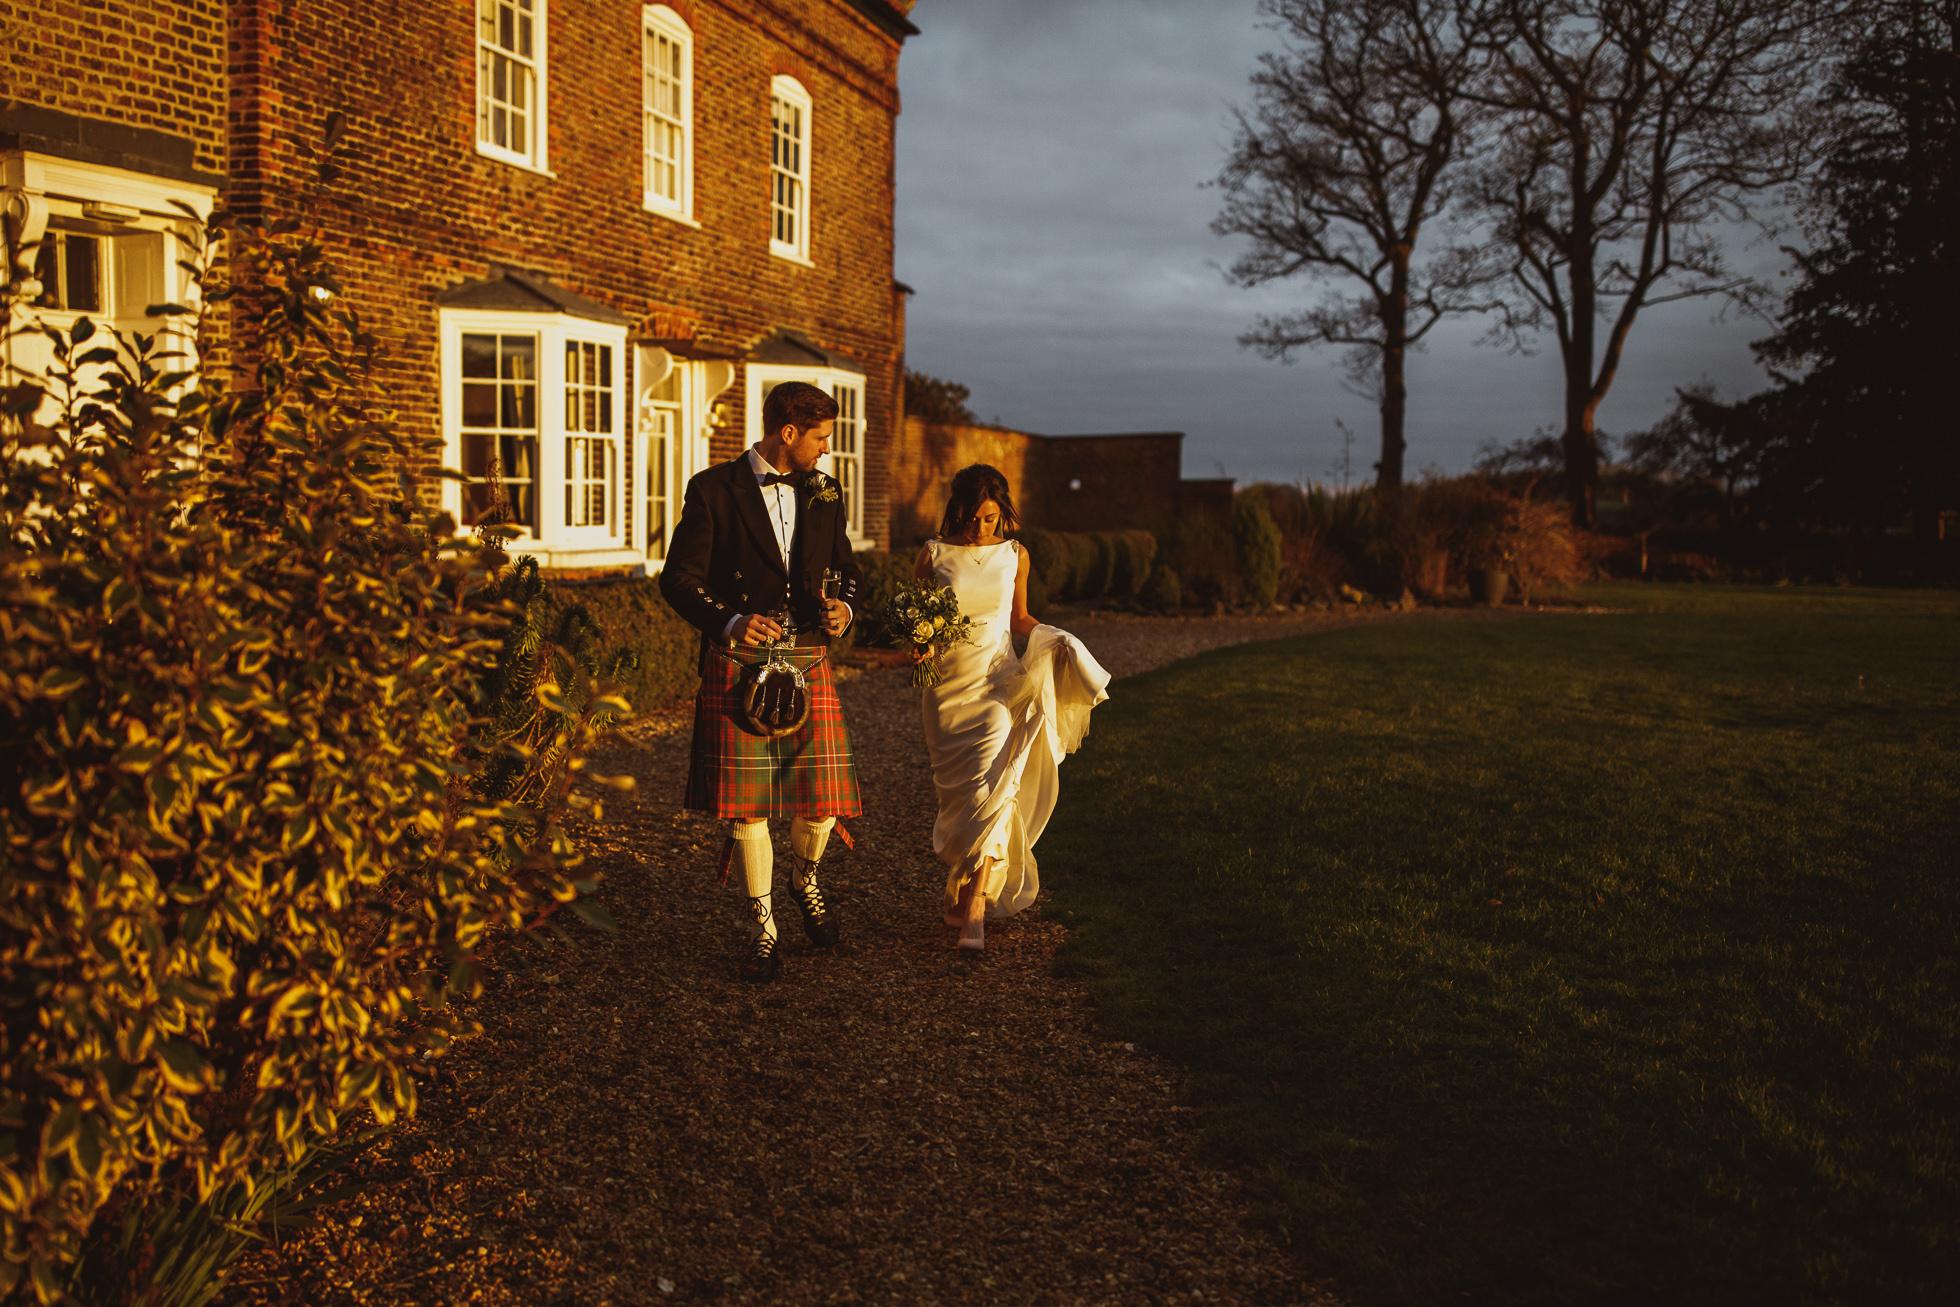 hornington_manor_wedding_photographer-50.jpg